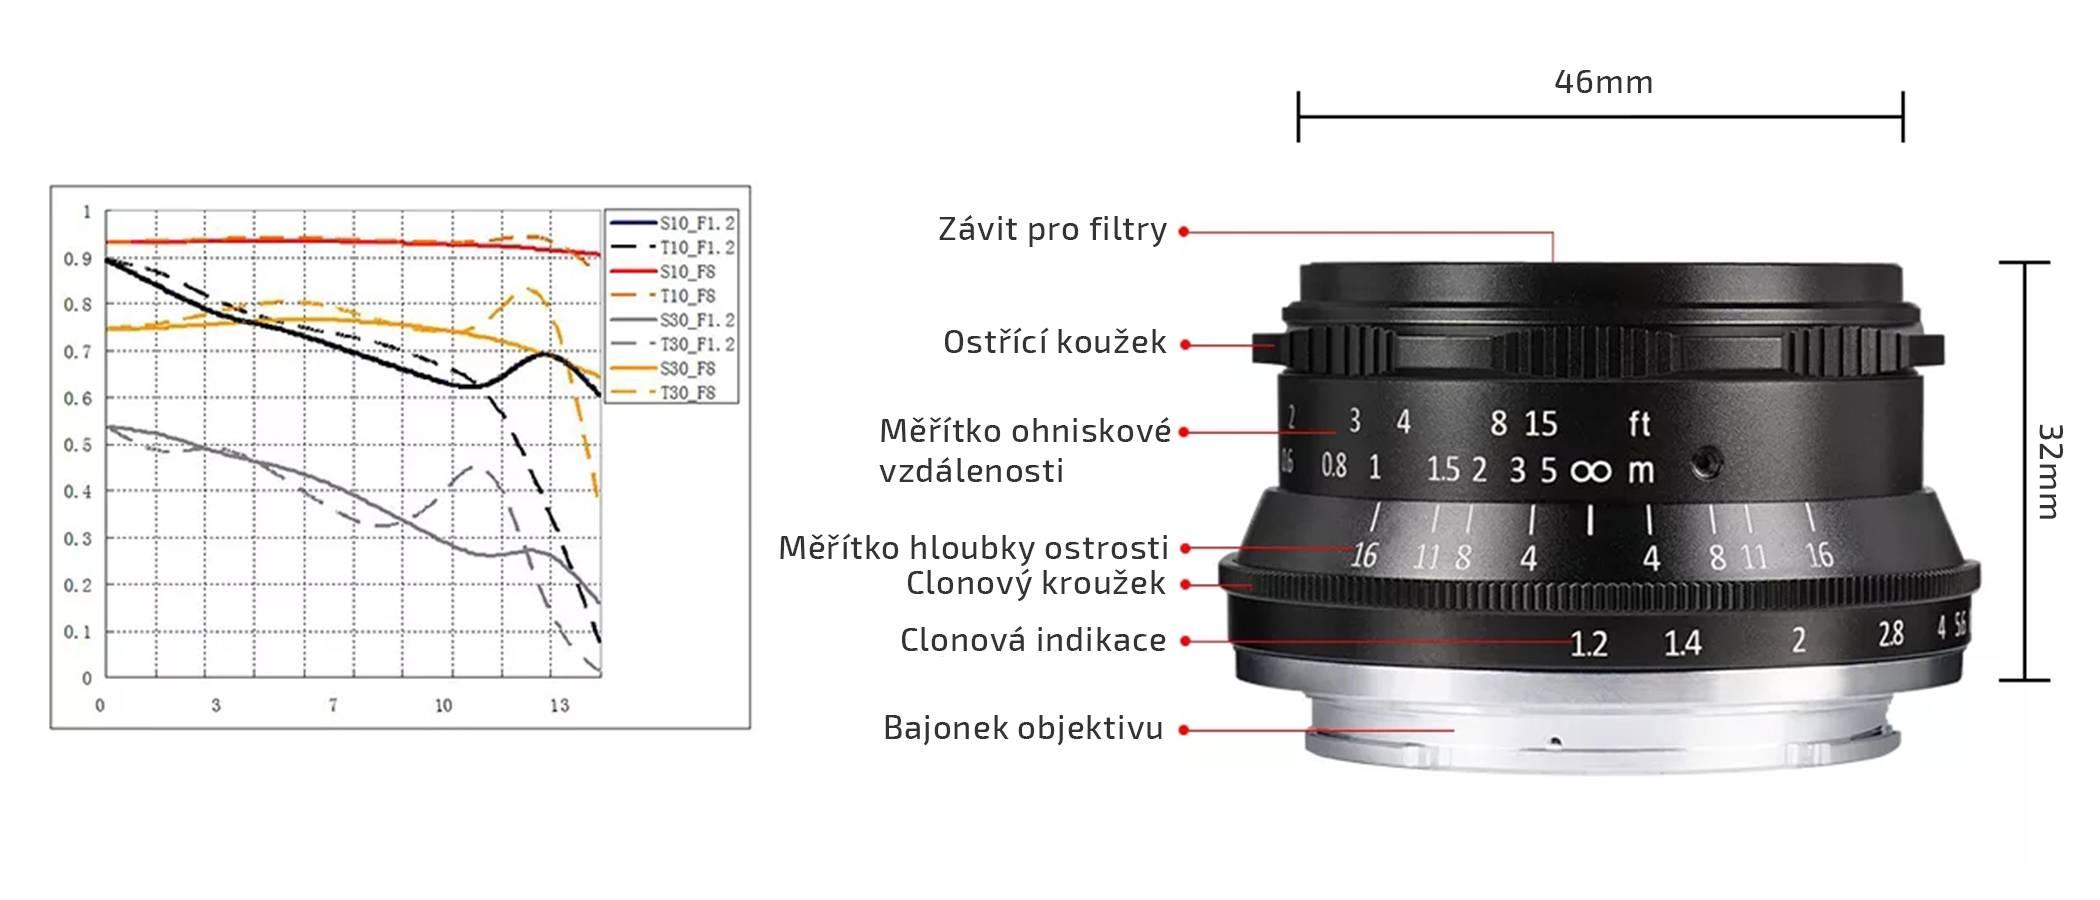 film-technika-7artisans-35-mm-aps-c-objektiv-popis